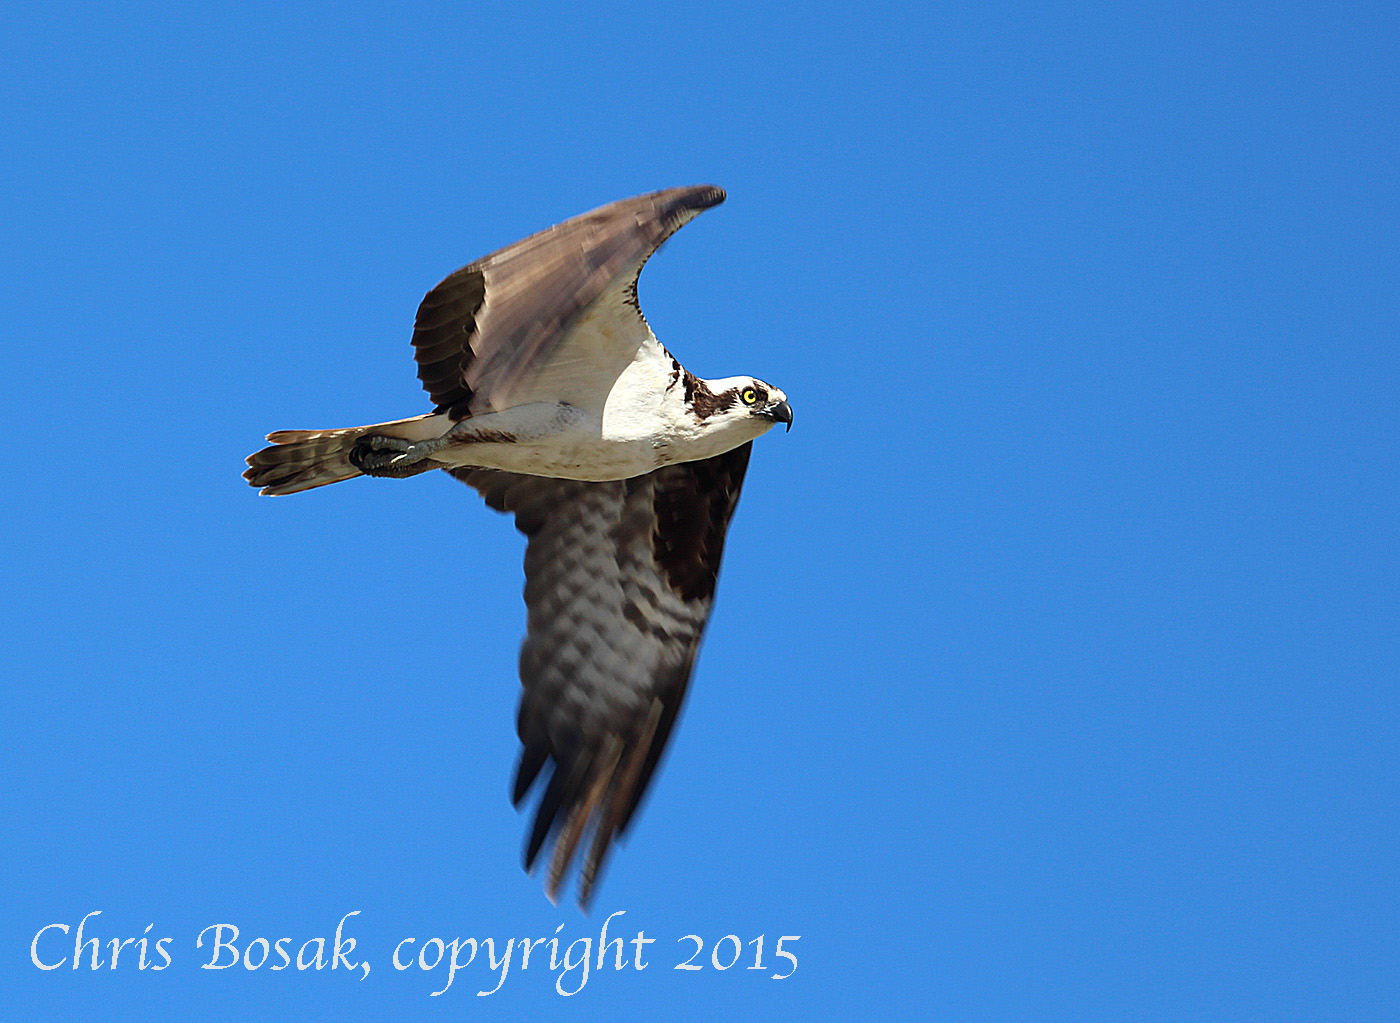 Photo by Chrisi Bosak An Osprey flies over Veterans Park in Norwalk, Conn., April 29, 2015.